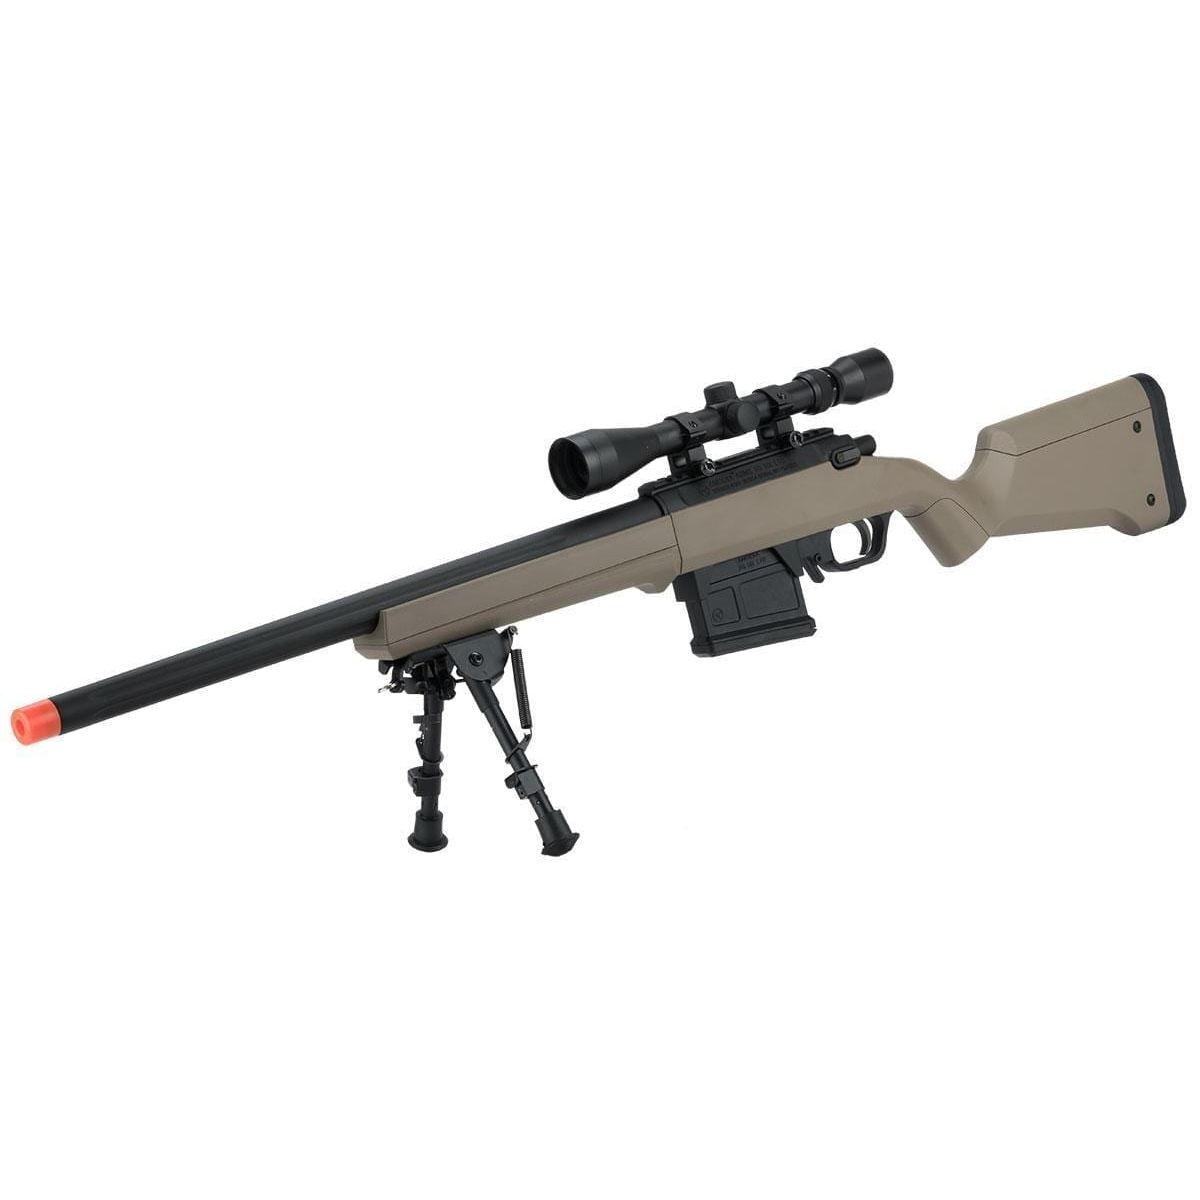 Gen2 S1 Bolt Action Sniper Rifle brown amoeba